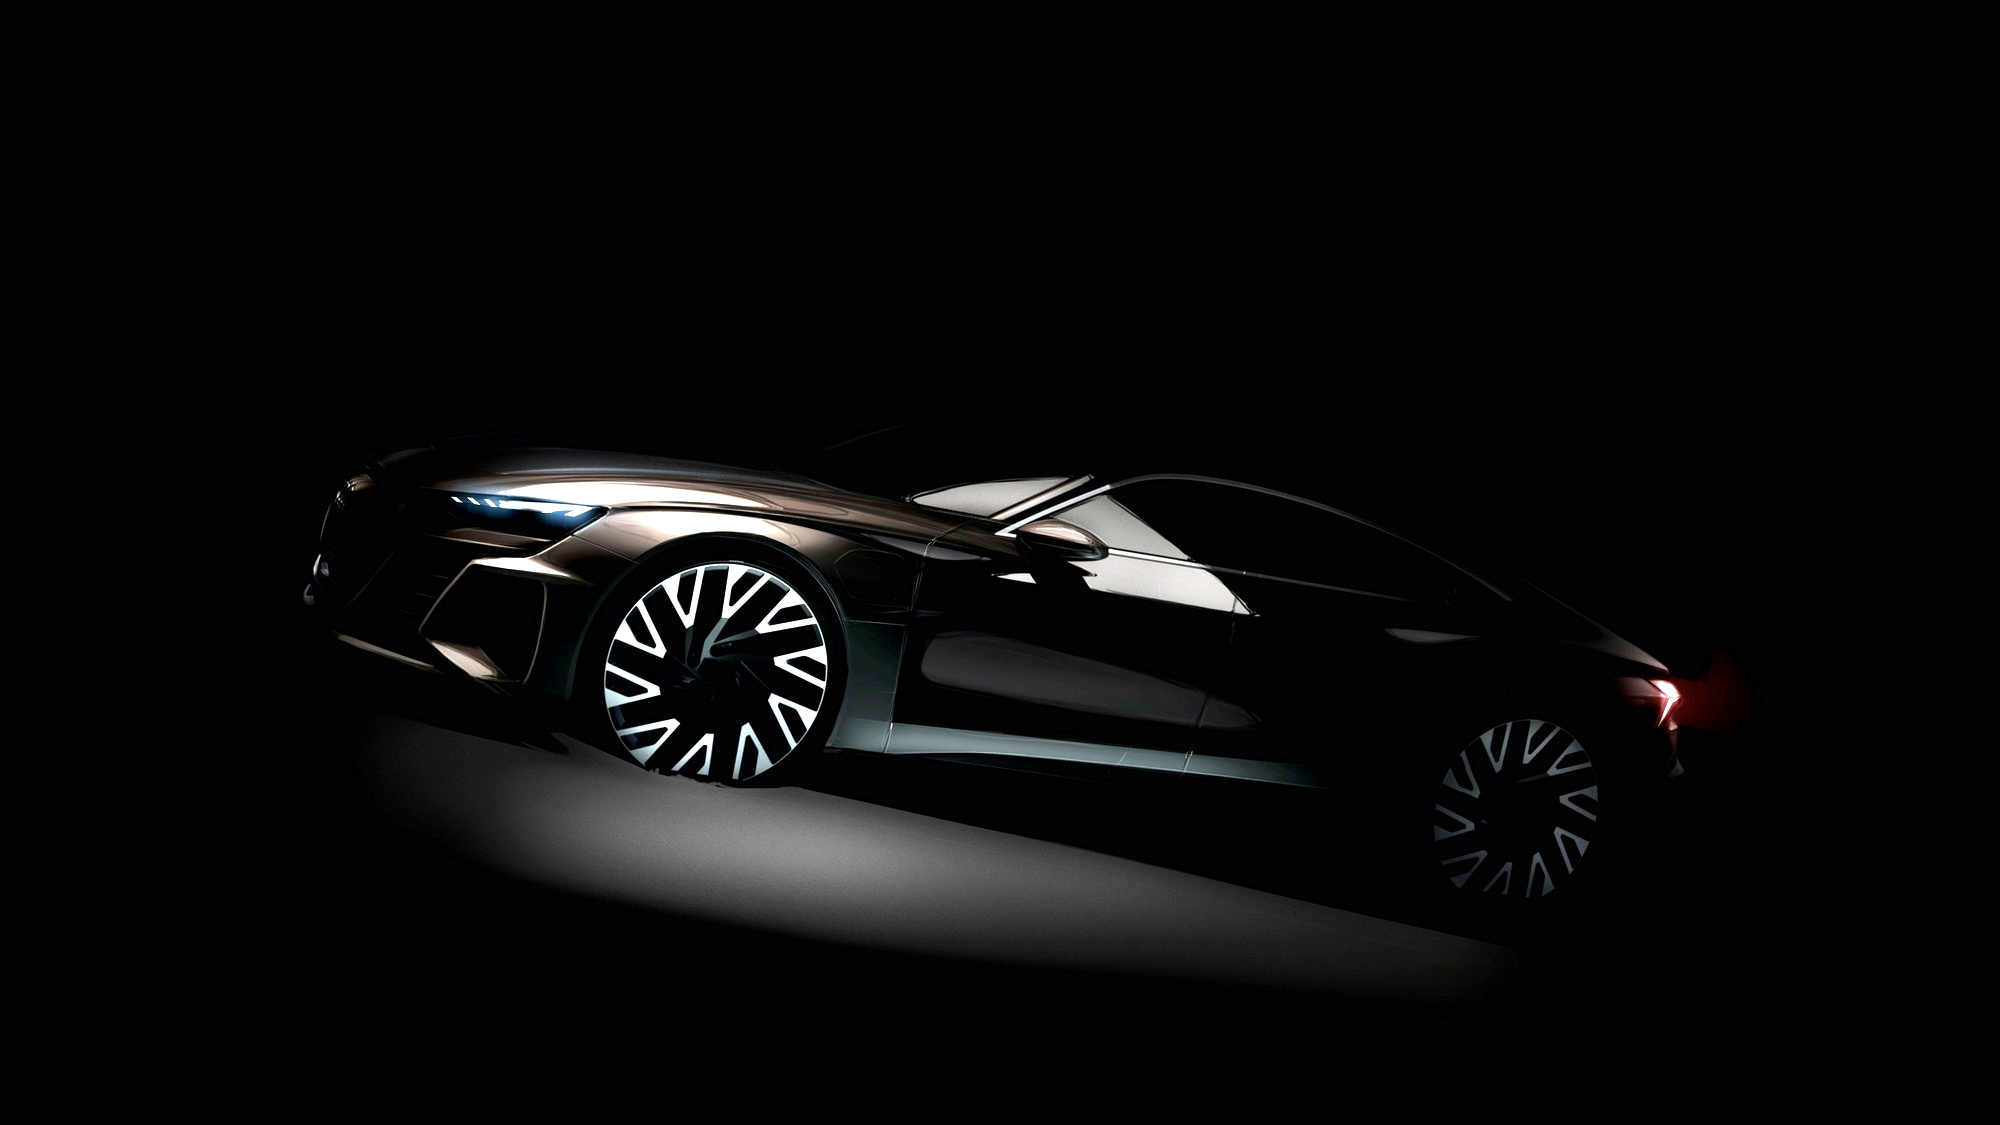 Ауди разрабатывает четырехдверный электрокар e-tron Gran Turismo